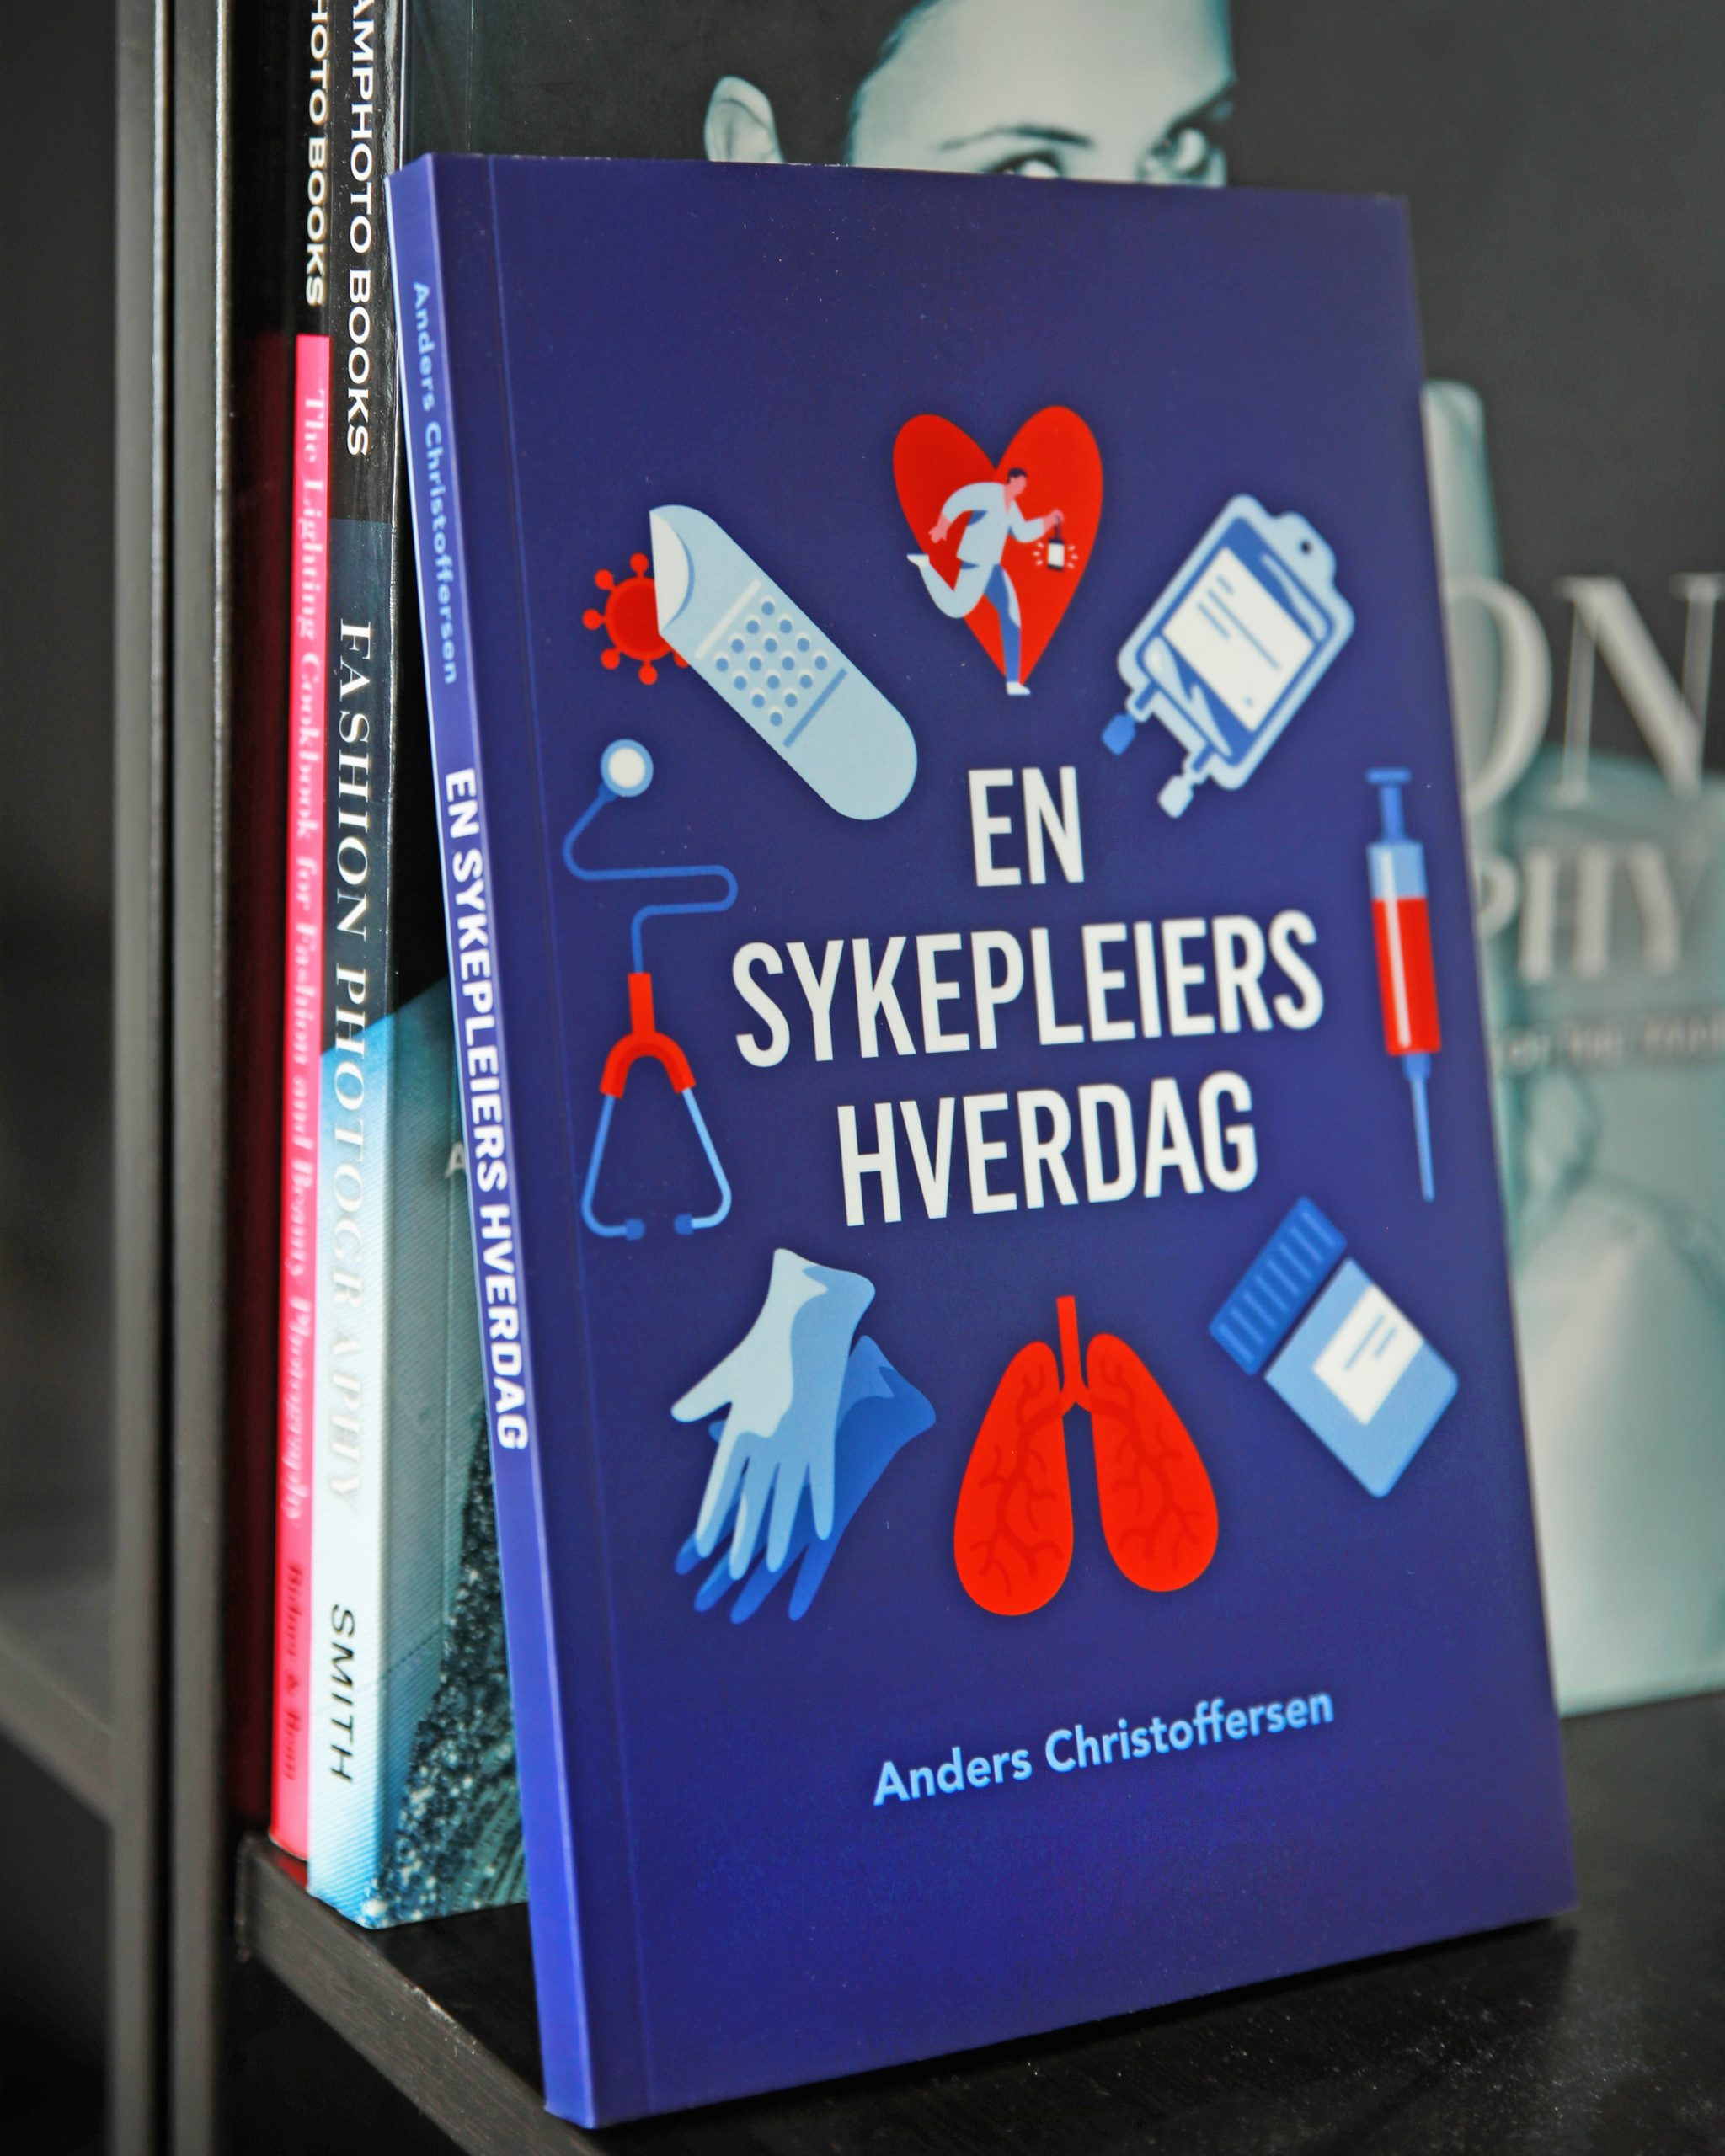 Bok-En-sykepleiers-hverdag-Anders Christoffersen-bok-cingulum-44